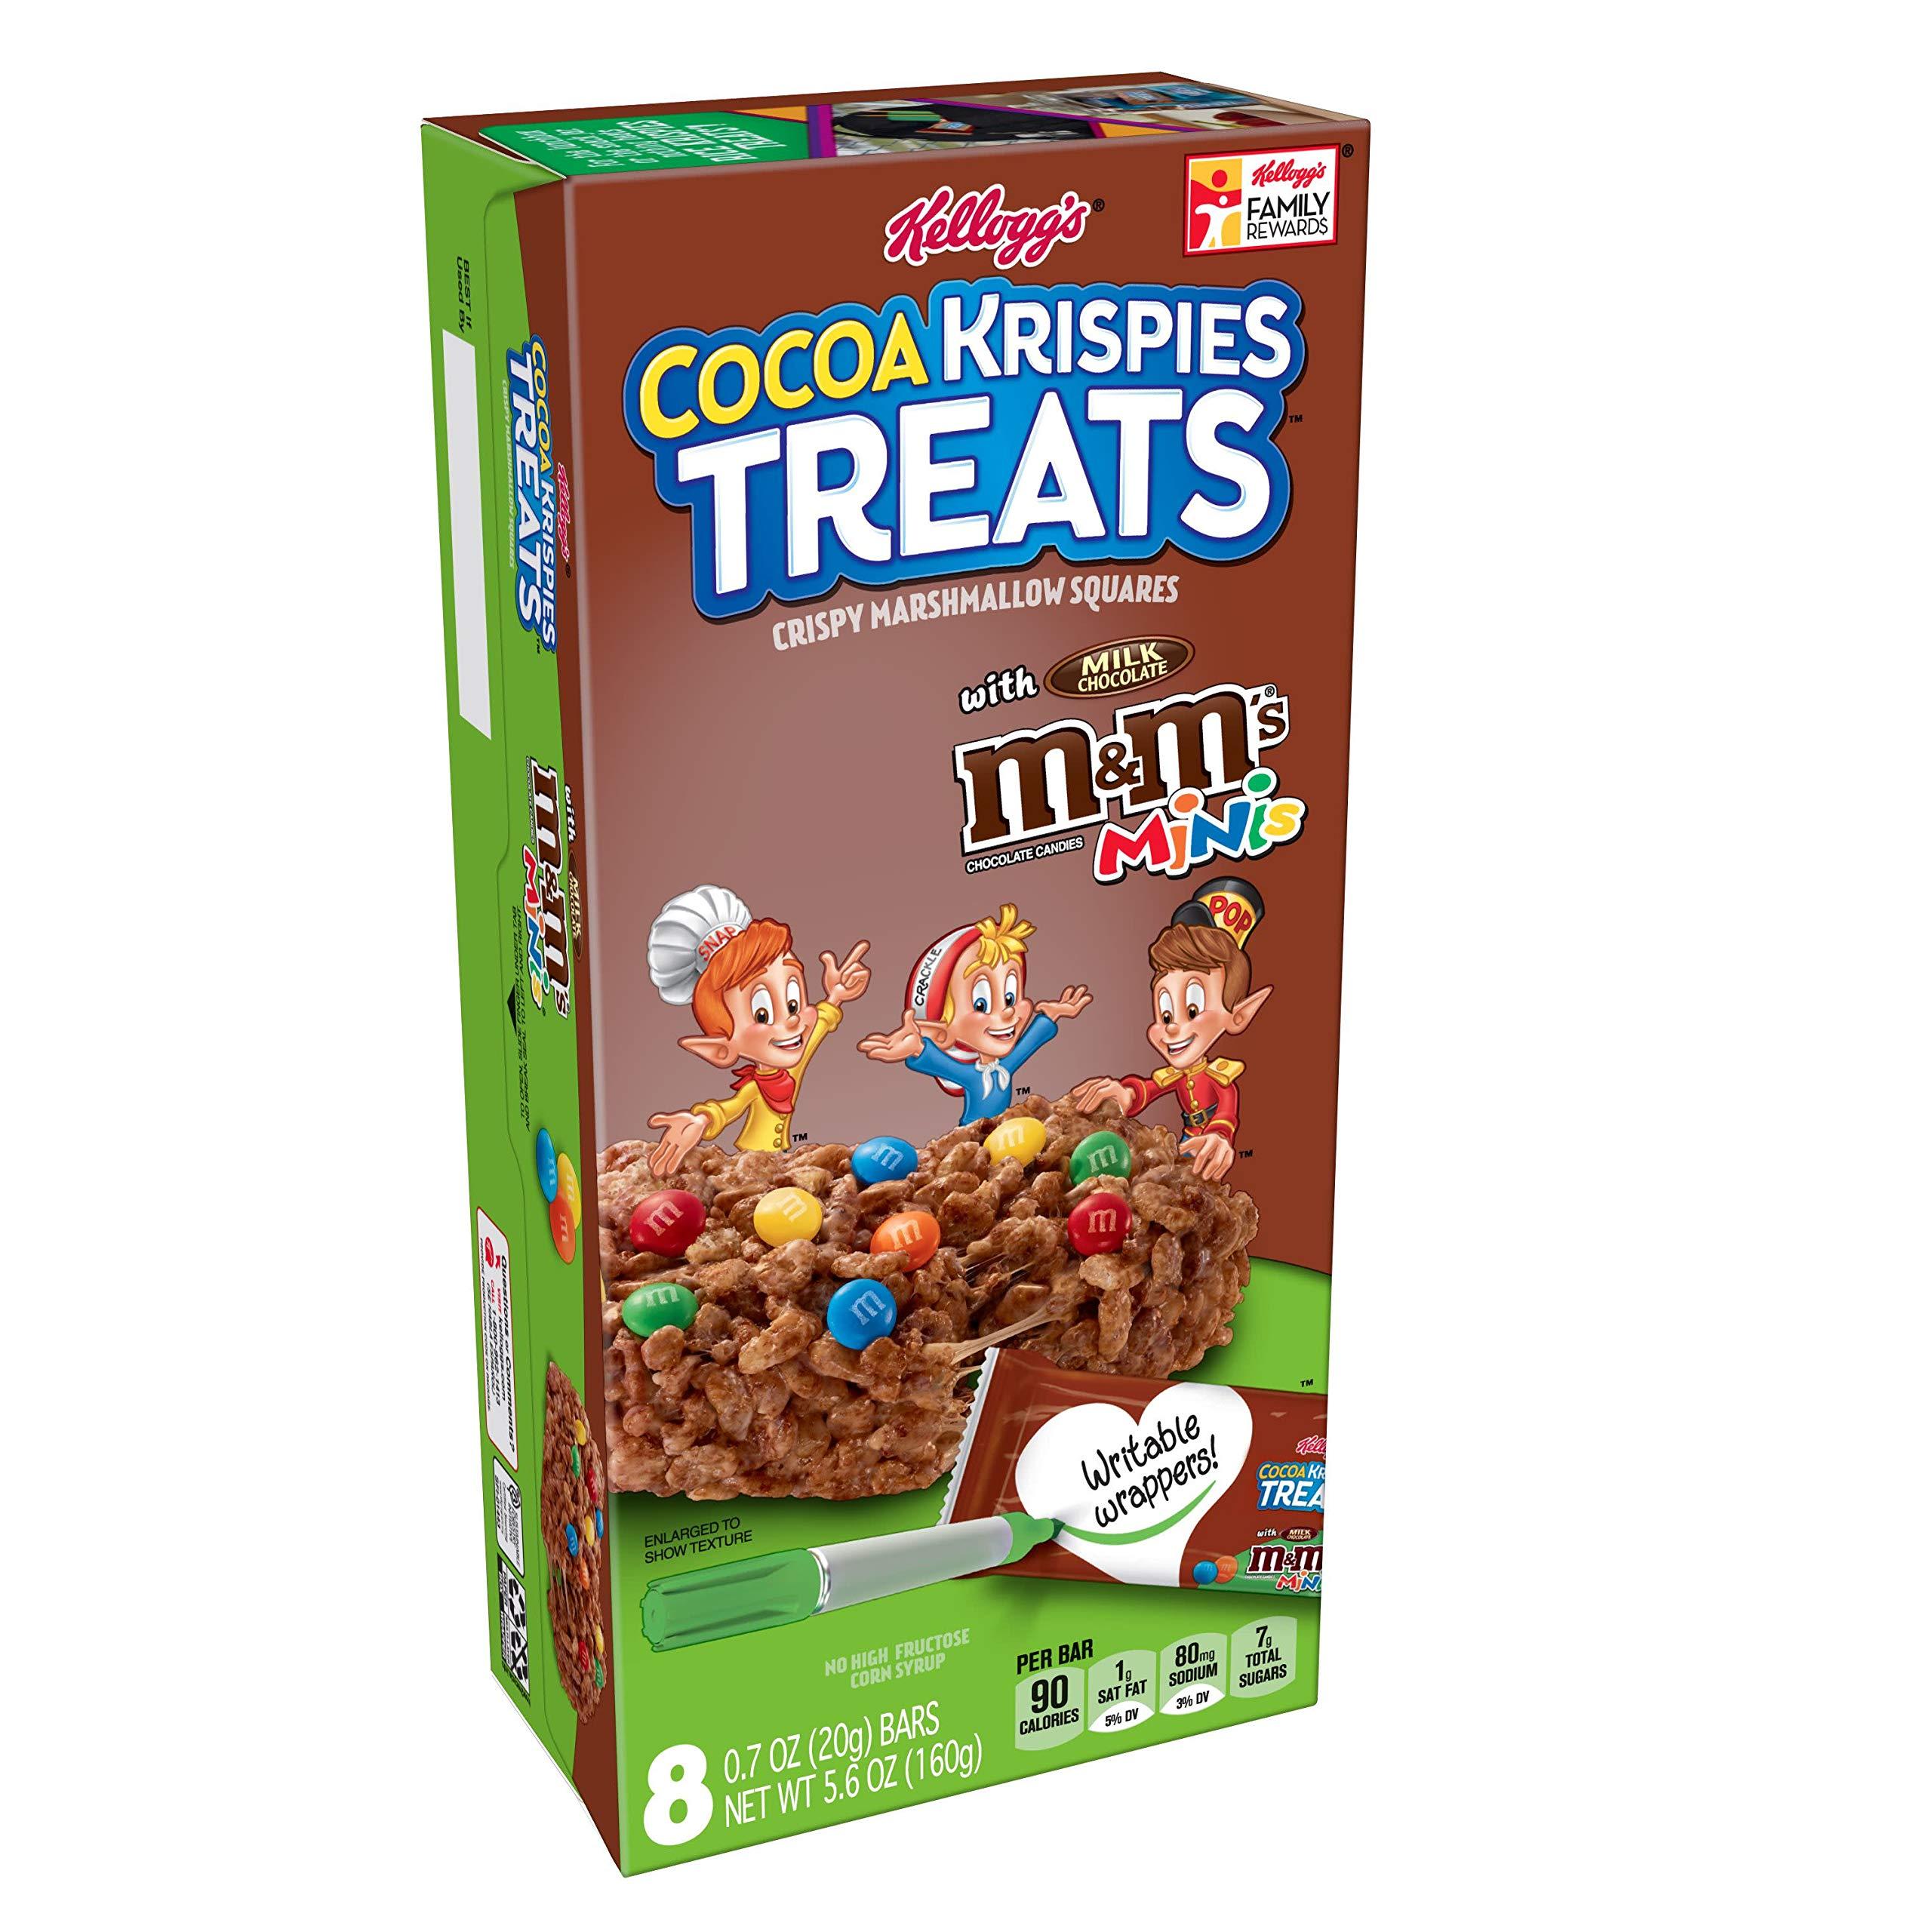 Kellogg's Cocoa Krispies Treats, Crispy Marshmallow Squares, Chocolate with M&Ms Minis, 5.6oz Box(8 Count)